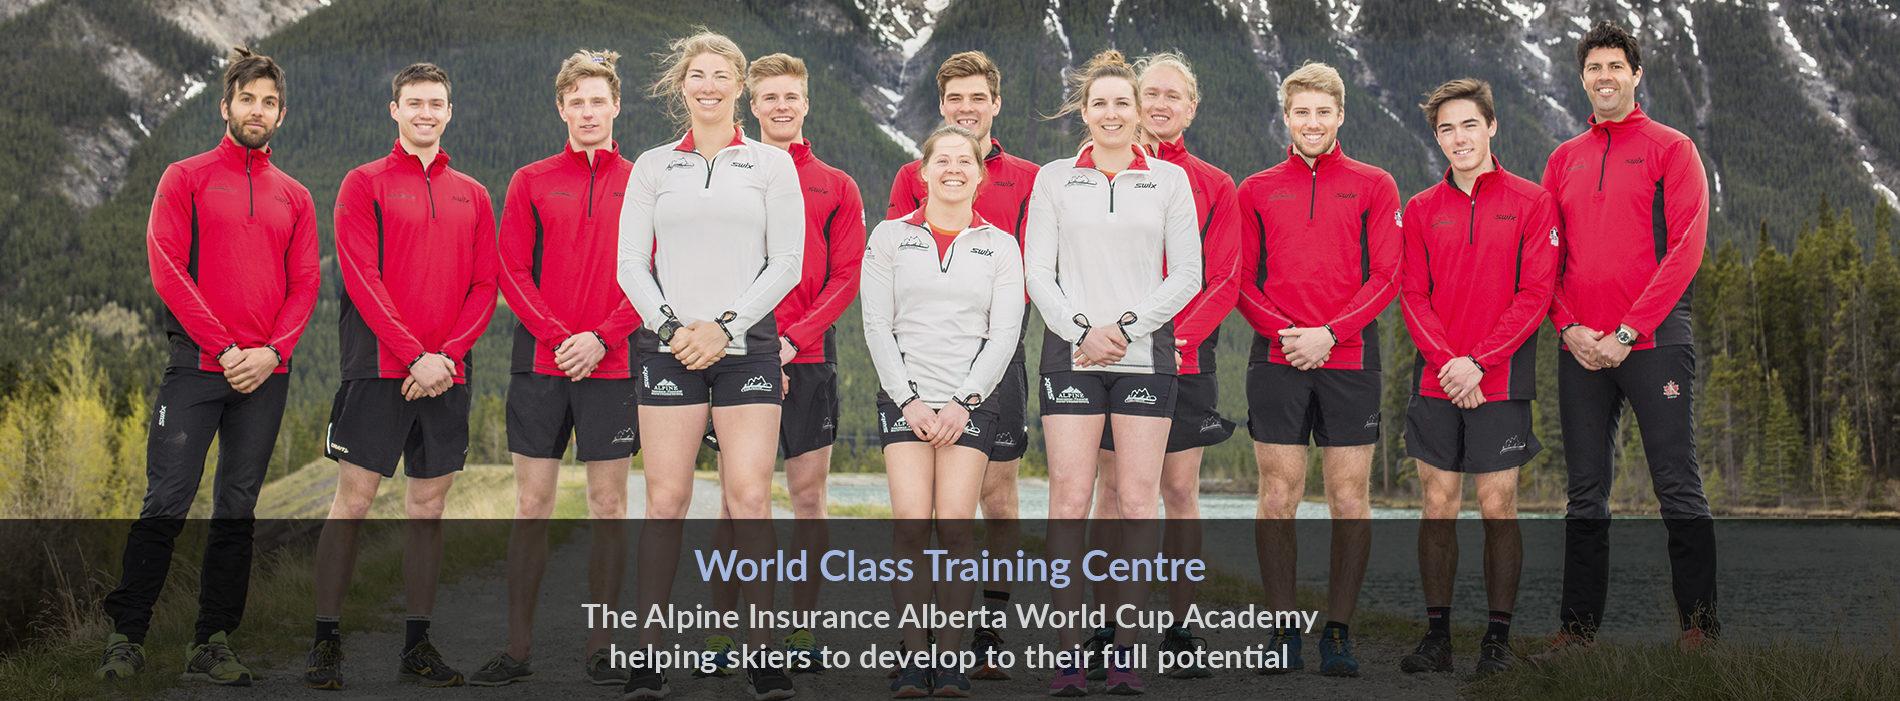 Alberta World Cup Academy 2017